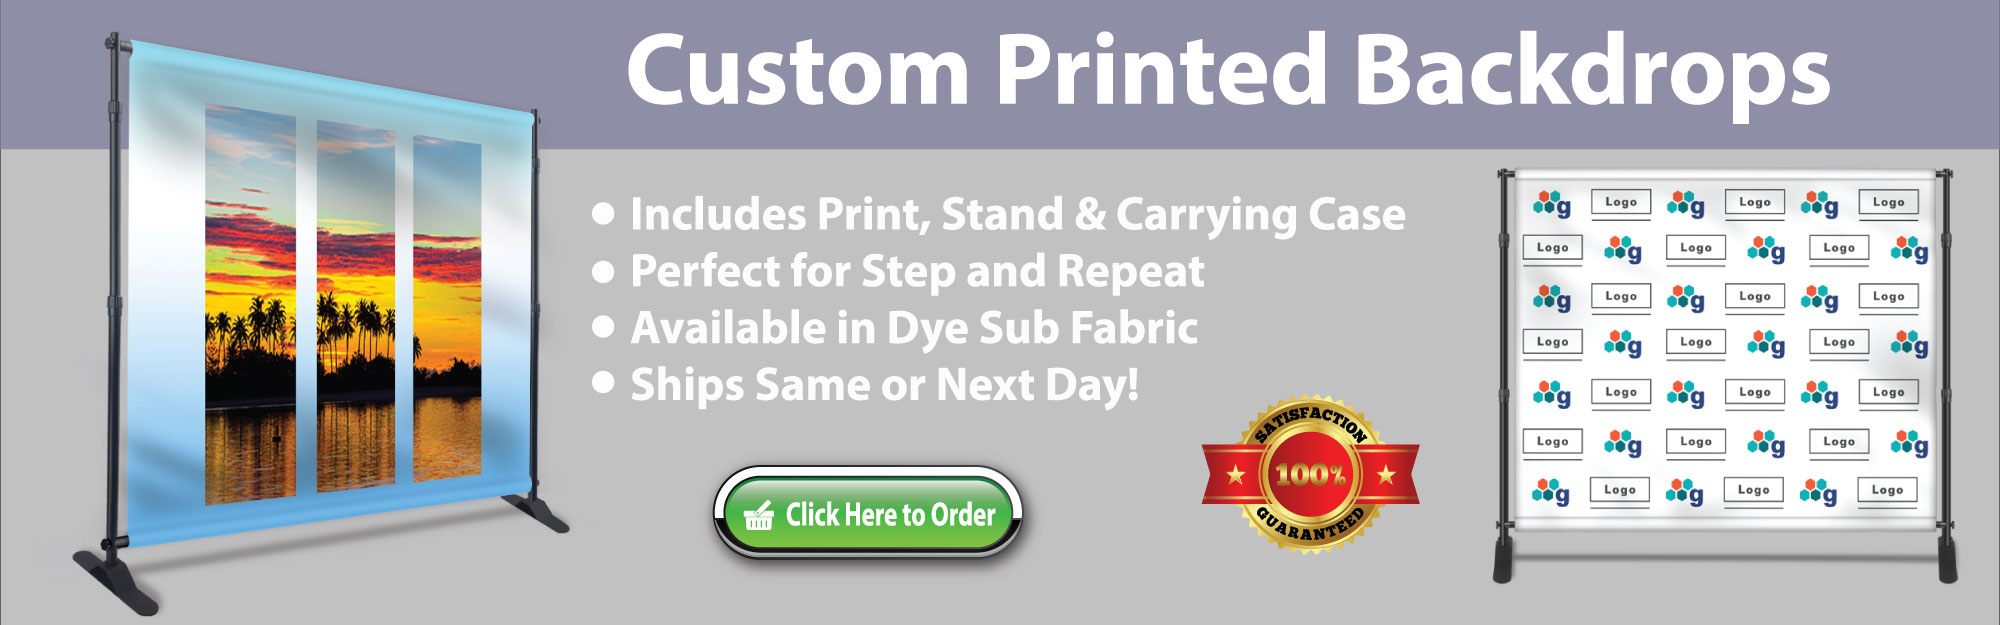 Custom Printed Backdrops